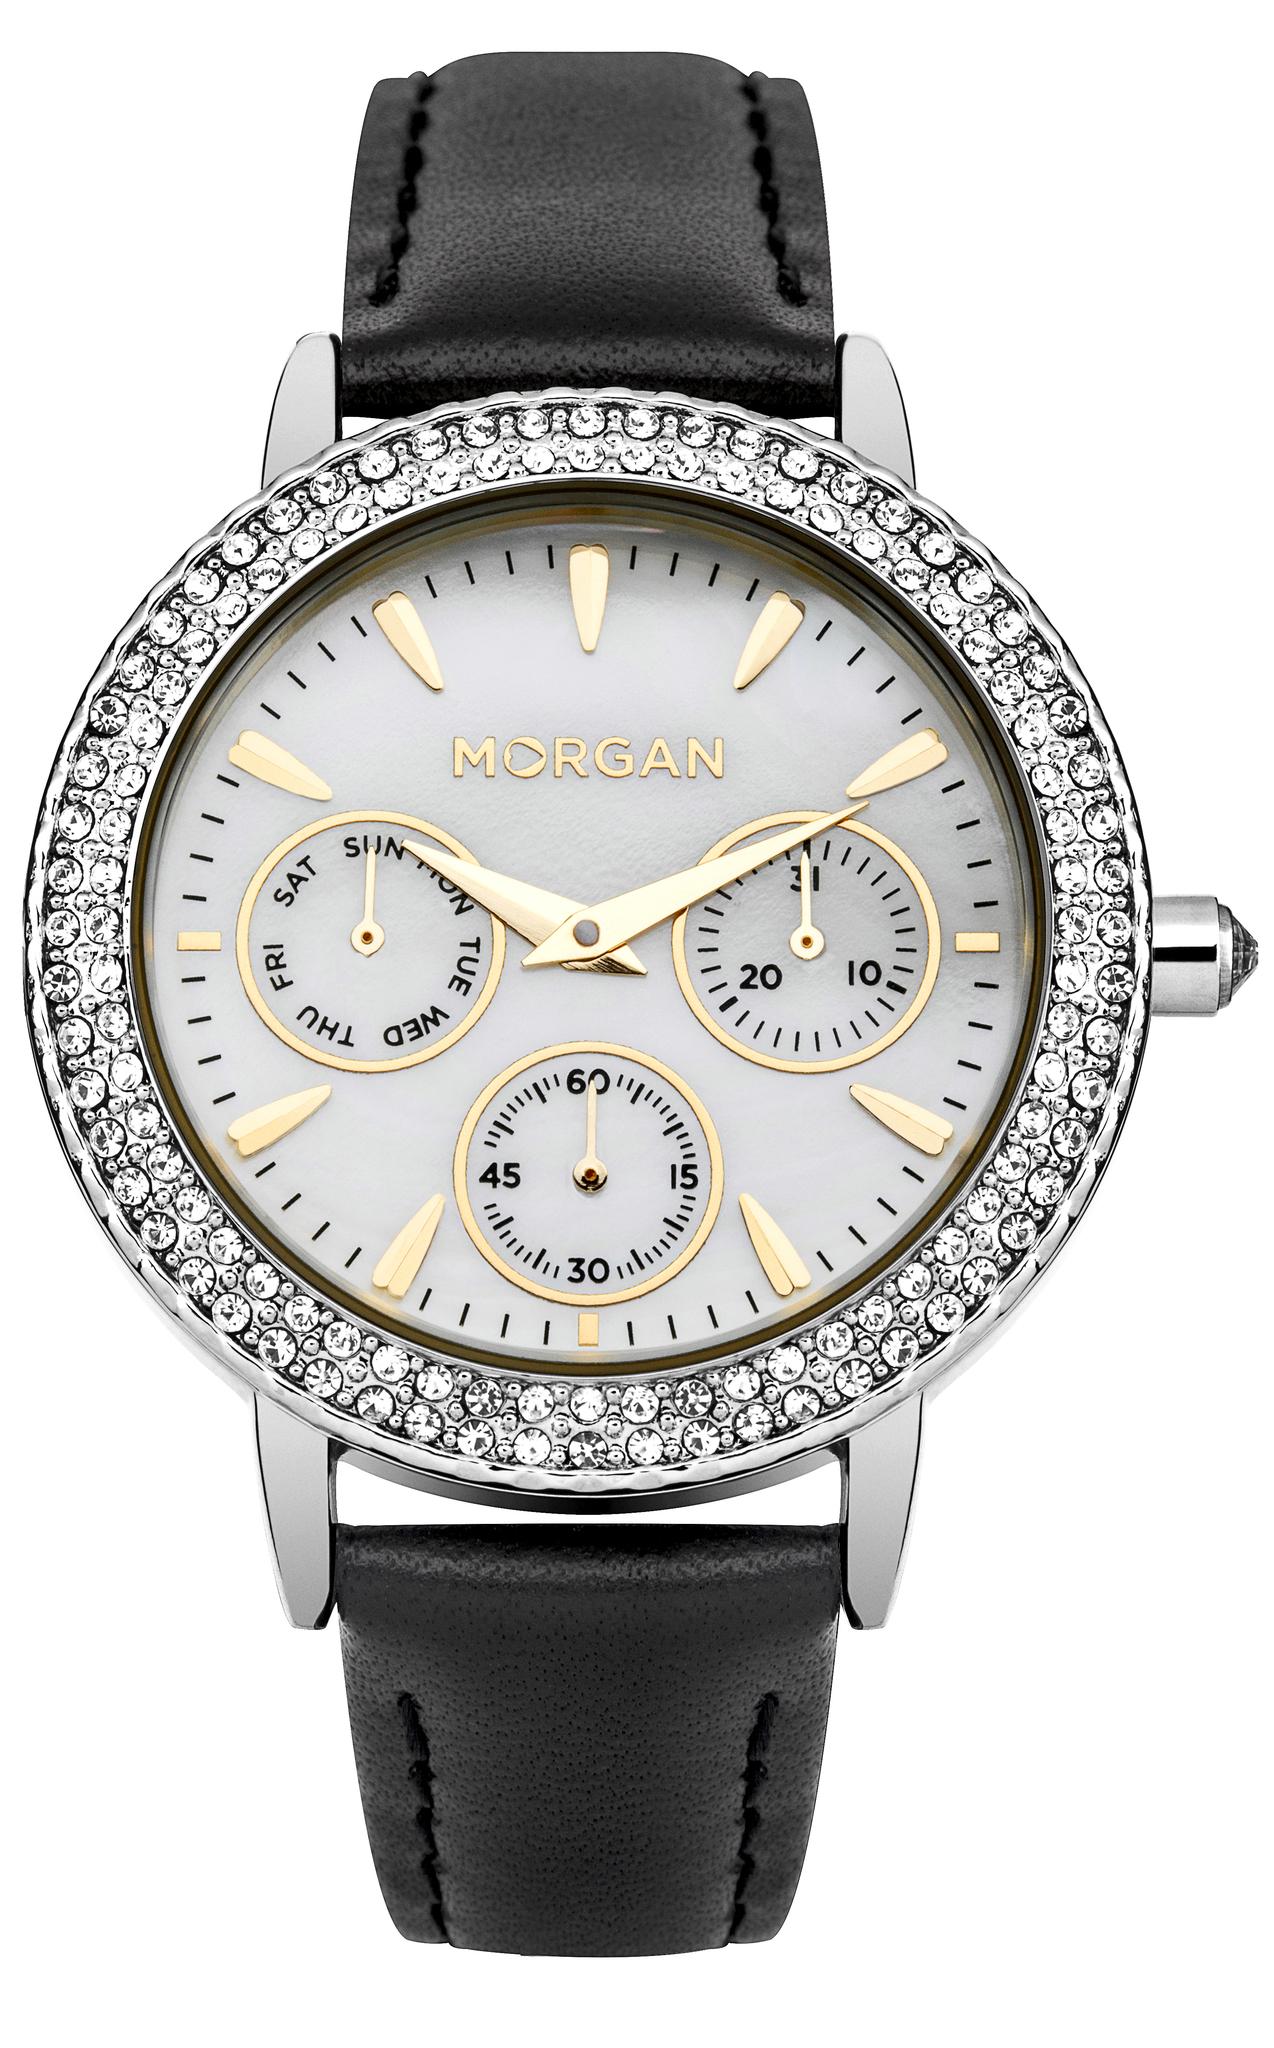 Morgan M1248B - женские наручные часы из коллекции LAETITIAMorgan<br><br><br>Бренд: Morgan<br>Модель: Morgan M1248B<br>Артикул: M1248B<br>Вариант артикула: None<br>Коллекция: LAETITIA<br>Подколлекция: None<br>Страна: Франция<br>Пол: женские<br>Тип механизма: кварцевые<br>Механизм: Miyota VD75<br>Количество камней: None<br>Автоподзавод: None<br>Источник энергии: от батарейки<br>Срок службы элемента питания: None<br>Дисплей: стрелки<br>Цифры: отсутствуют<br>Водозащита: WR 30<br>Противоударные: None<br>Материал корпуса: нерж. сталь<br>Материал браслета: кожа<br>Материал безеля: None<br>Стекло: минеральное<br>Антибликовое покрытие: None<br>Цвет корпуса: None<br>Цвет браслета: None<br>Цвет циферблата: None<br>Цвет безеля: None<br>Размеры: 36 мм<br>Диаметр: None<br>Диаметр корпуса: None<br>Толщина: None<br>Ширина ремешка: None<br>Вес: None<br>Спорт-функции: None<br>Подсветка: None<br>Вставка: None<br>Отображение даты: число, день недели<br>Хронограф: None<br>Таймер: None<br>Термометр: None<br>Хронометр: None<br>GPS: None<br>Радиосинхронизация: None<br>Барометр: None<br>Скелетон: None<br>Дополнительная информация: None<br>Дополнительные функции: None